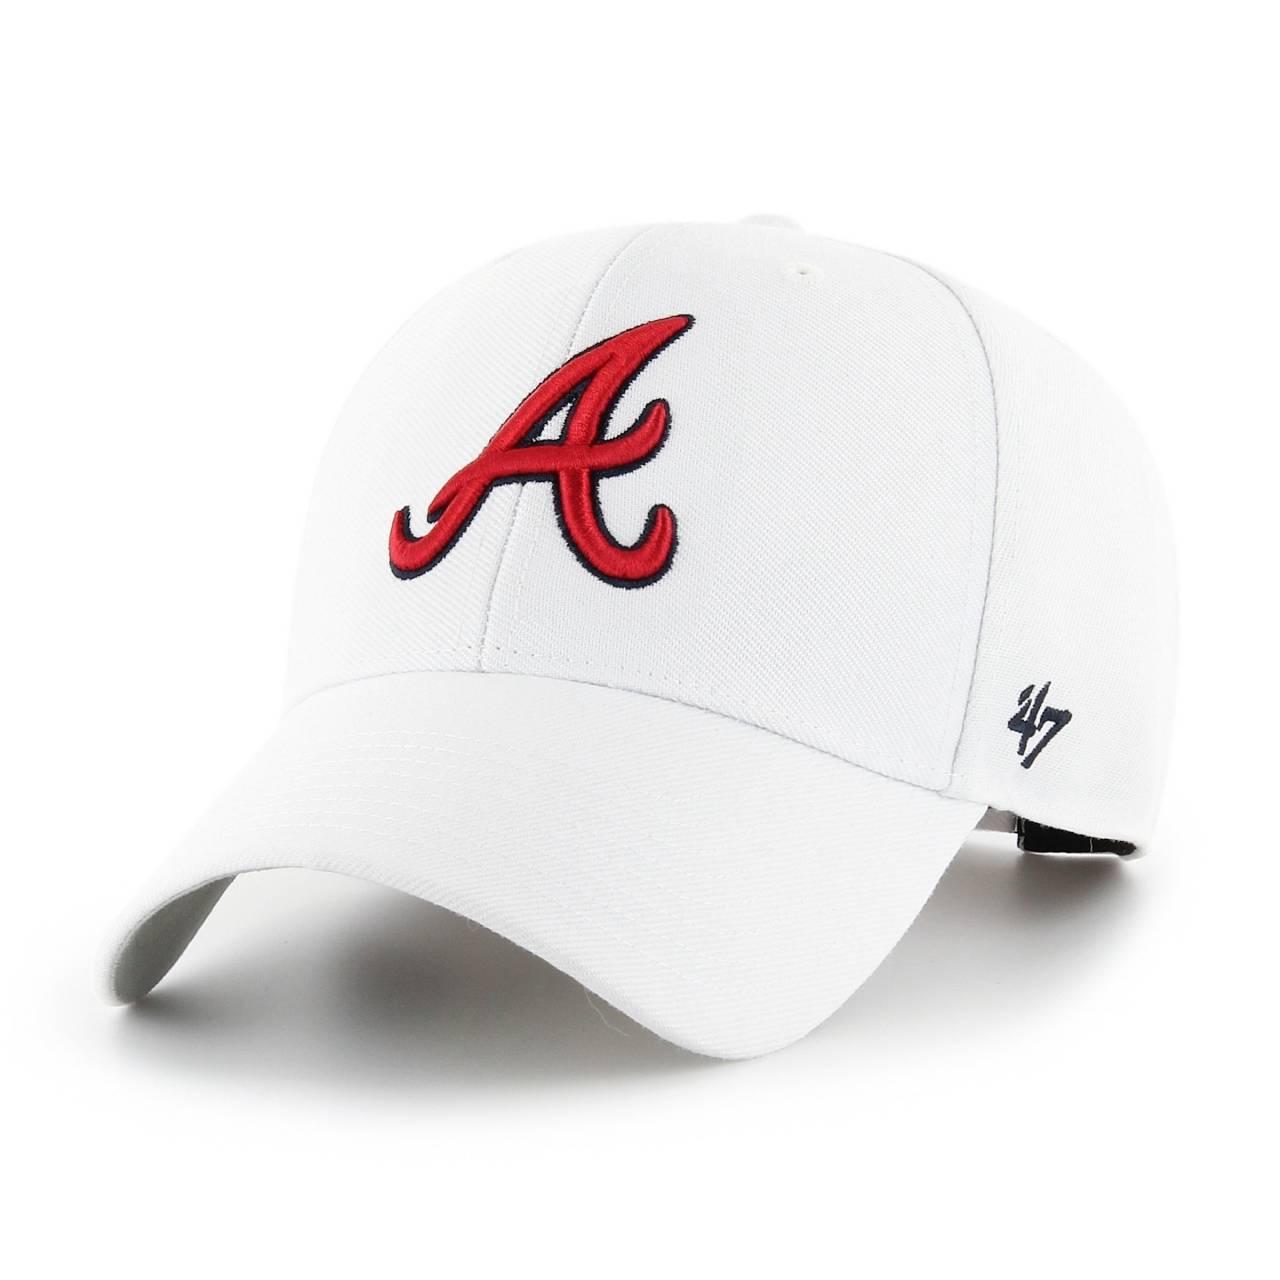 MLB ATLANTA BRAVES '47 MVP CAP WHITE